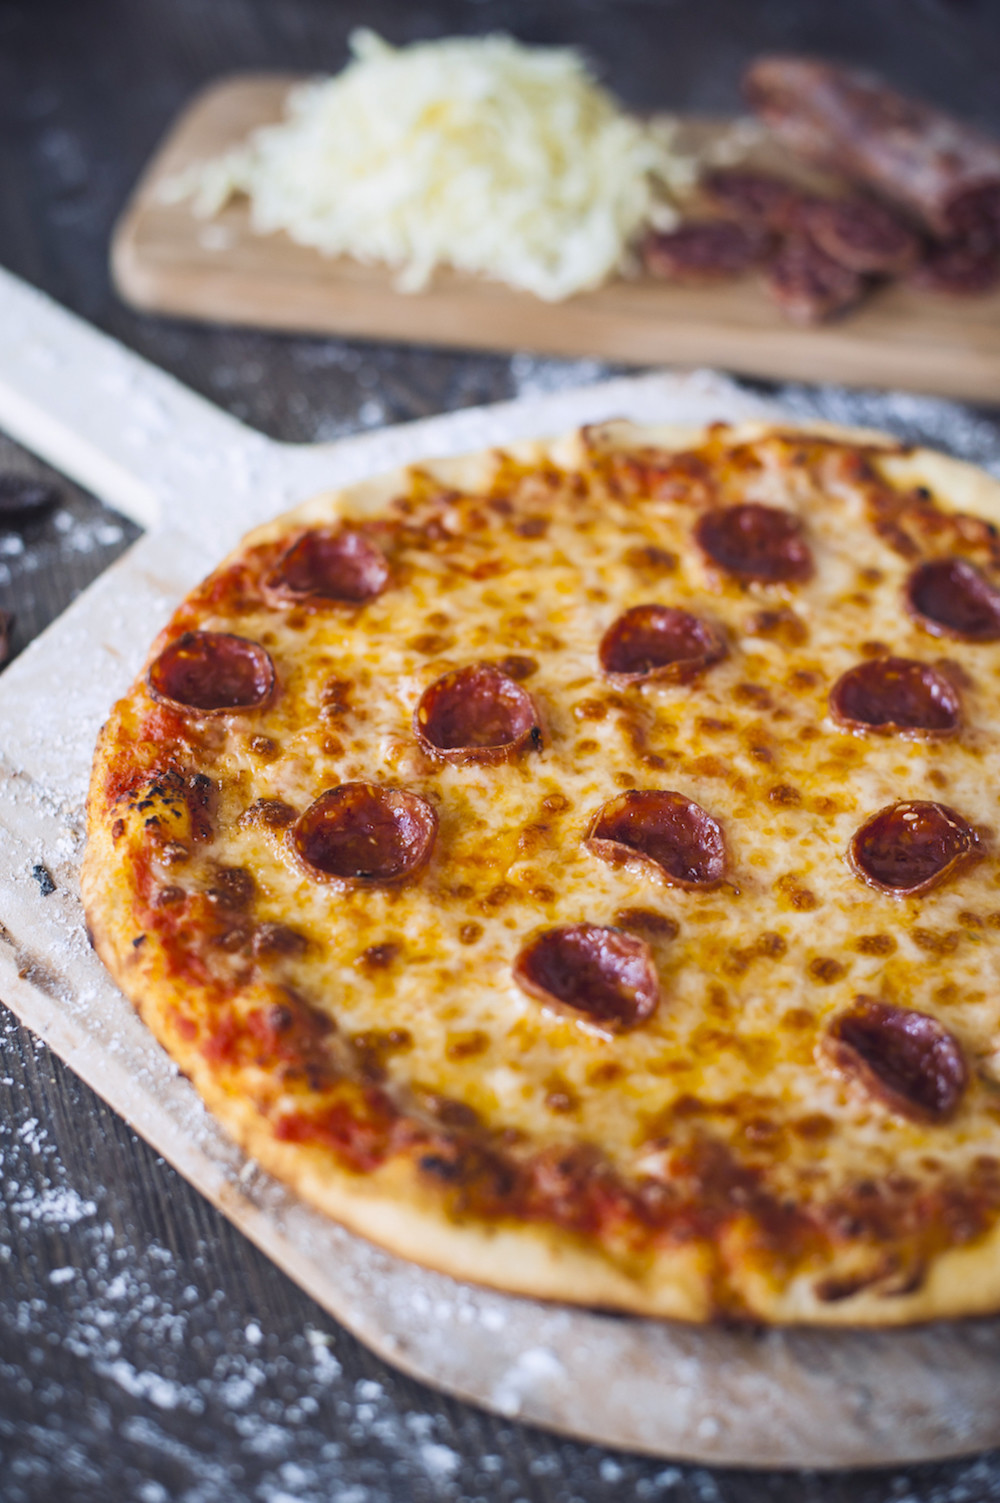 Little Mario's Pizzeria